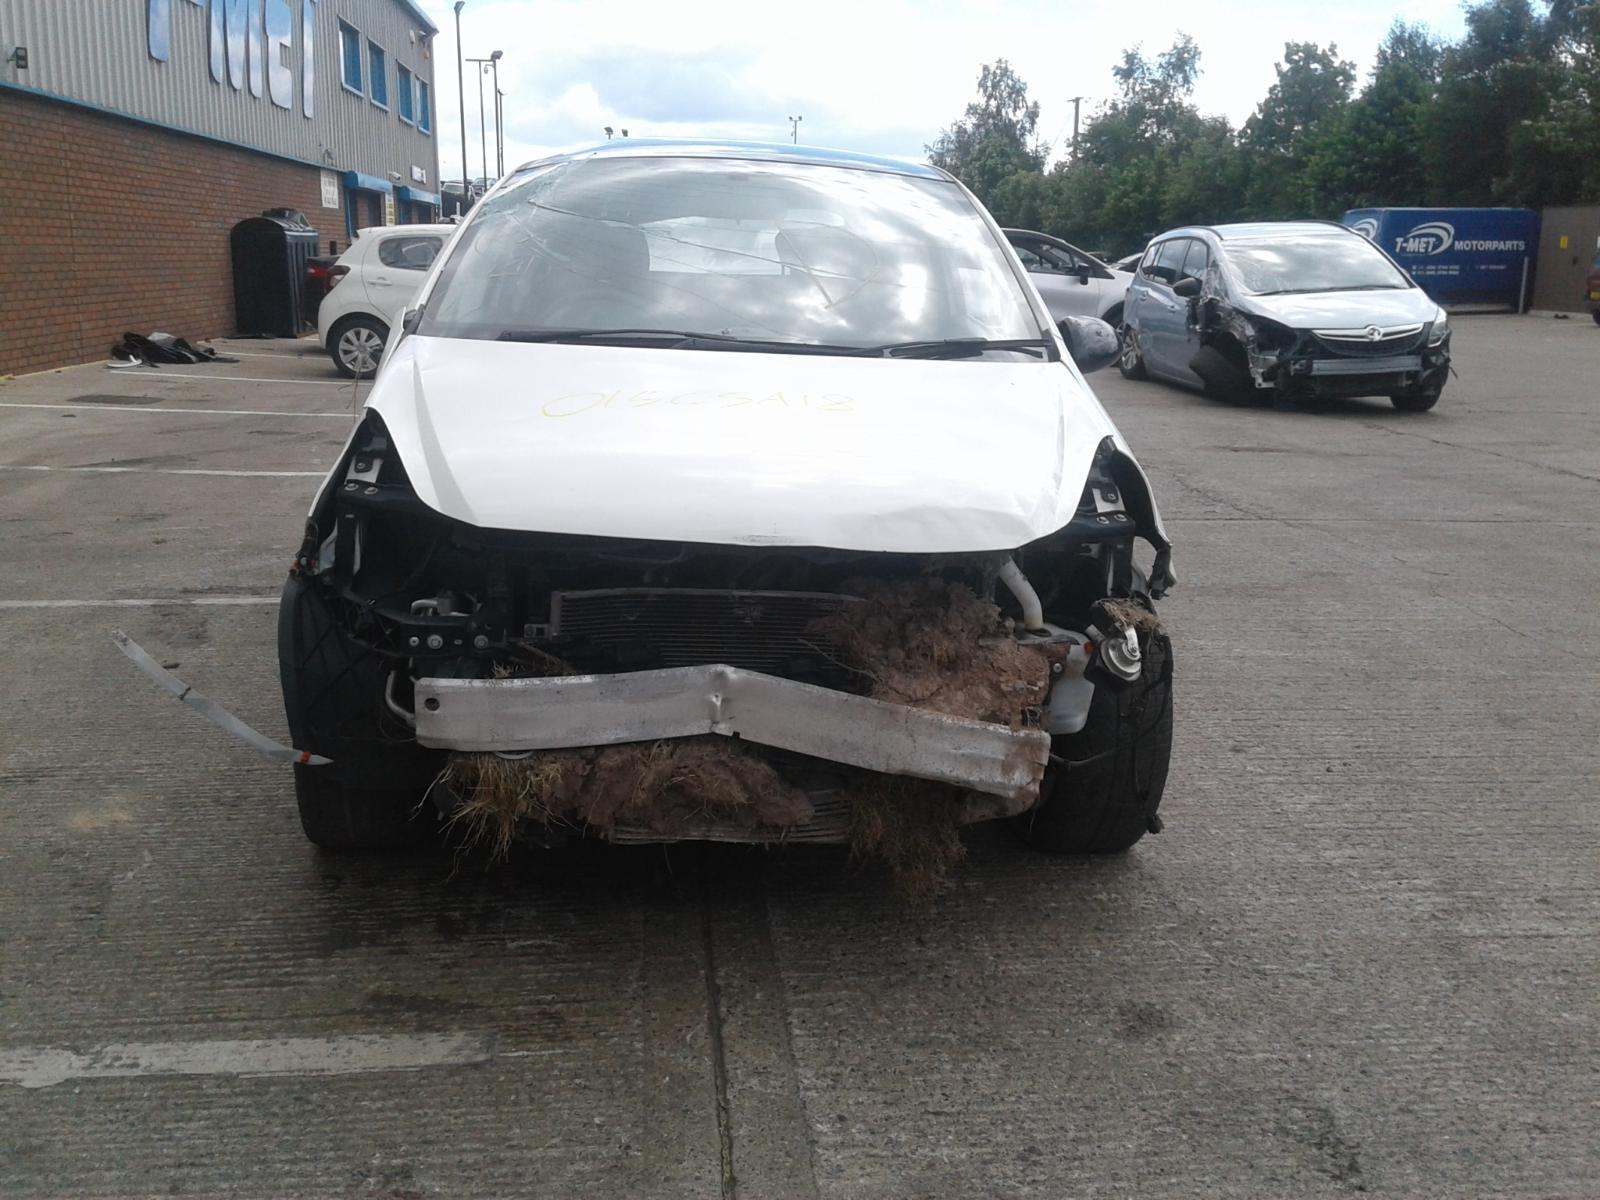 2012 Vauxhall CORSA LIMITED EDITION CDTI ECOFLEX Image